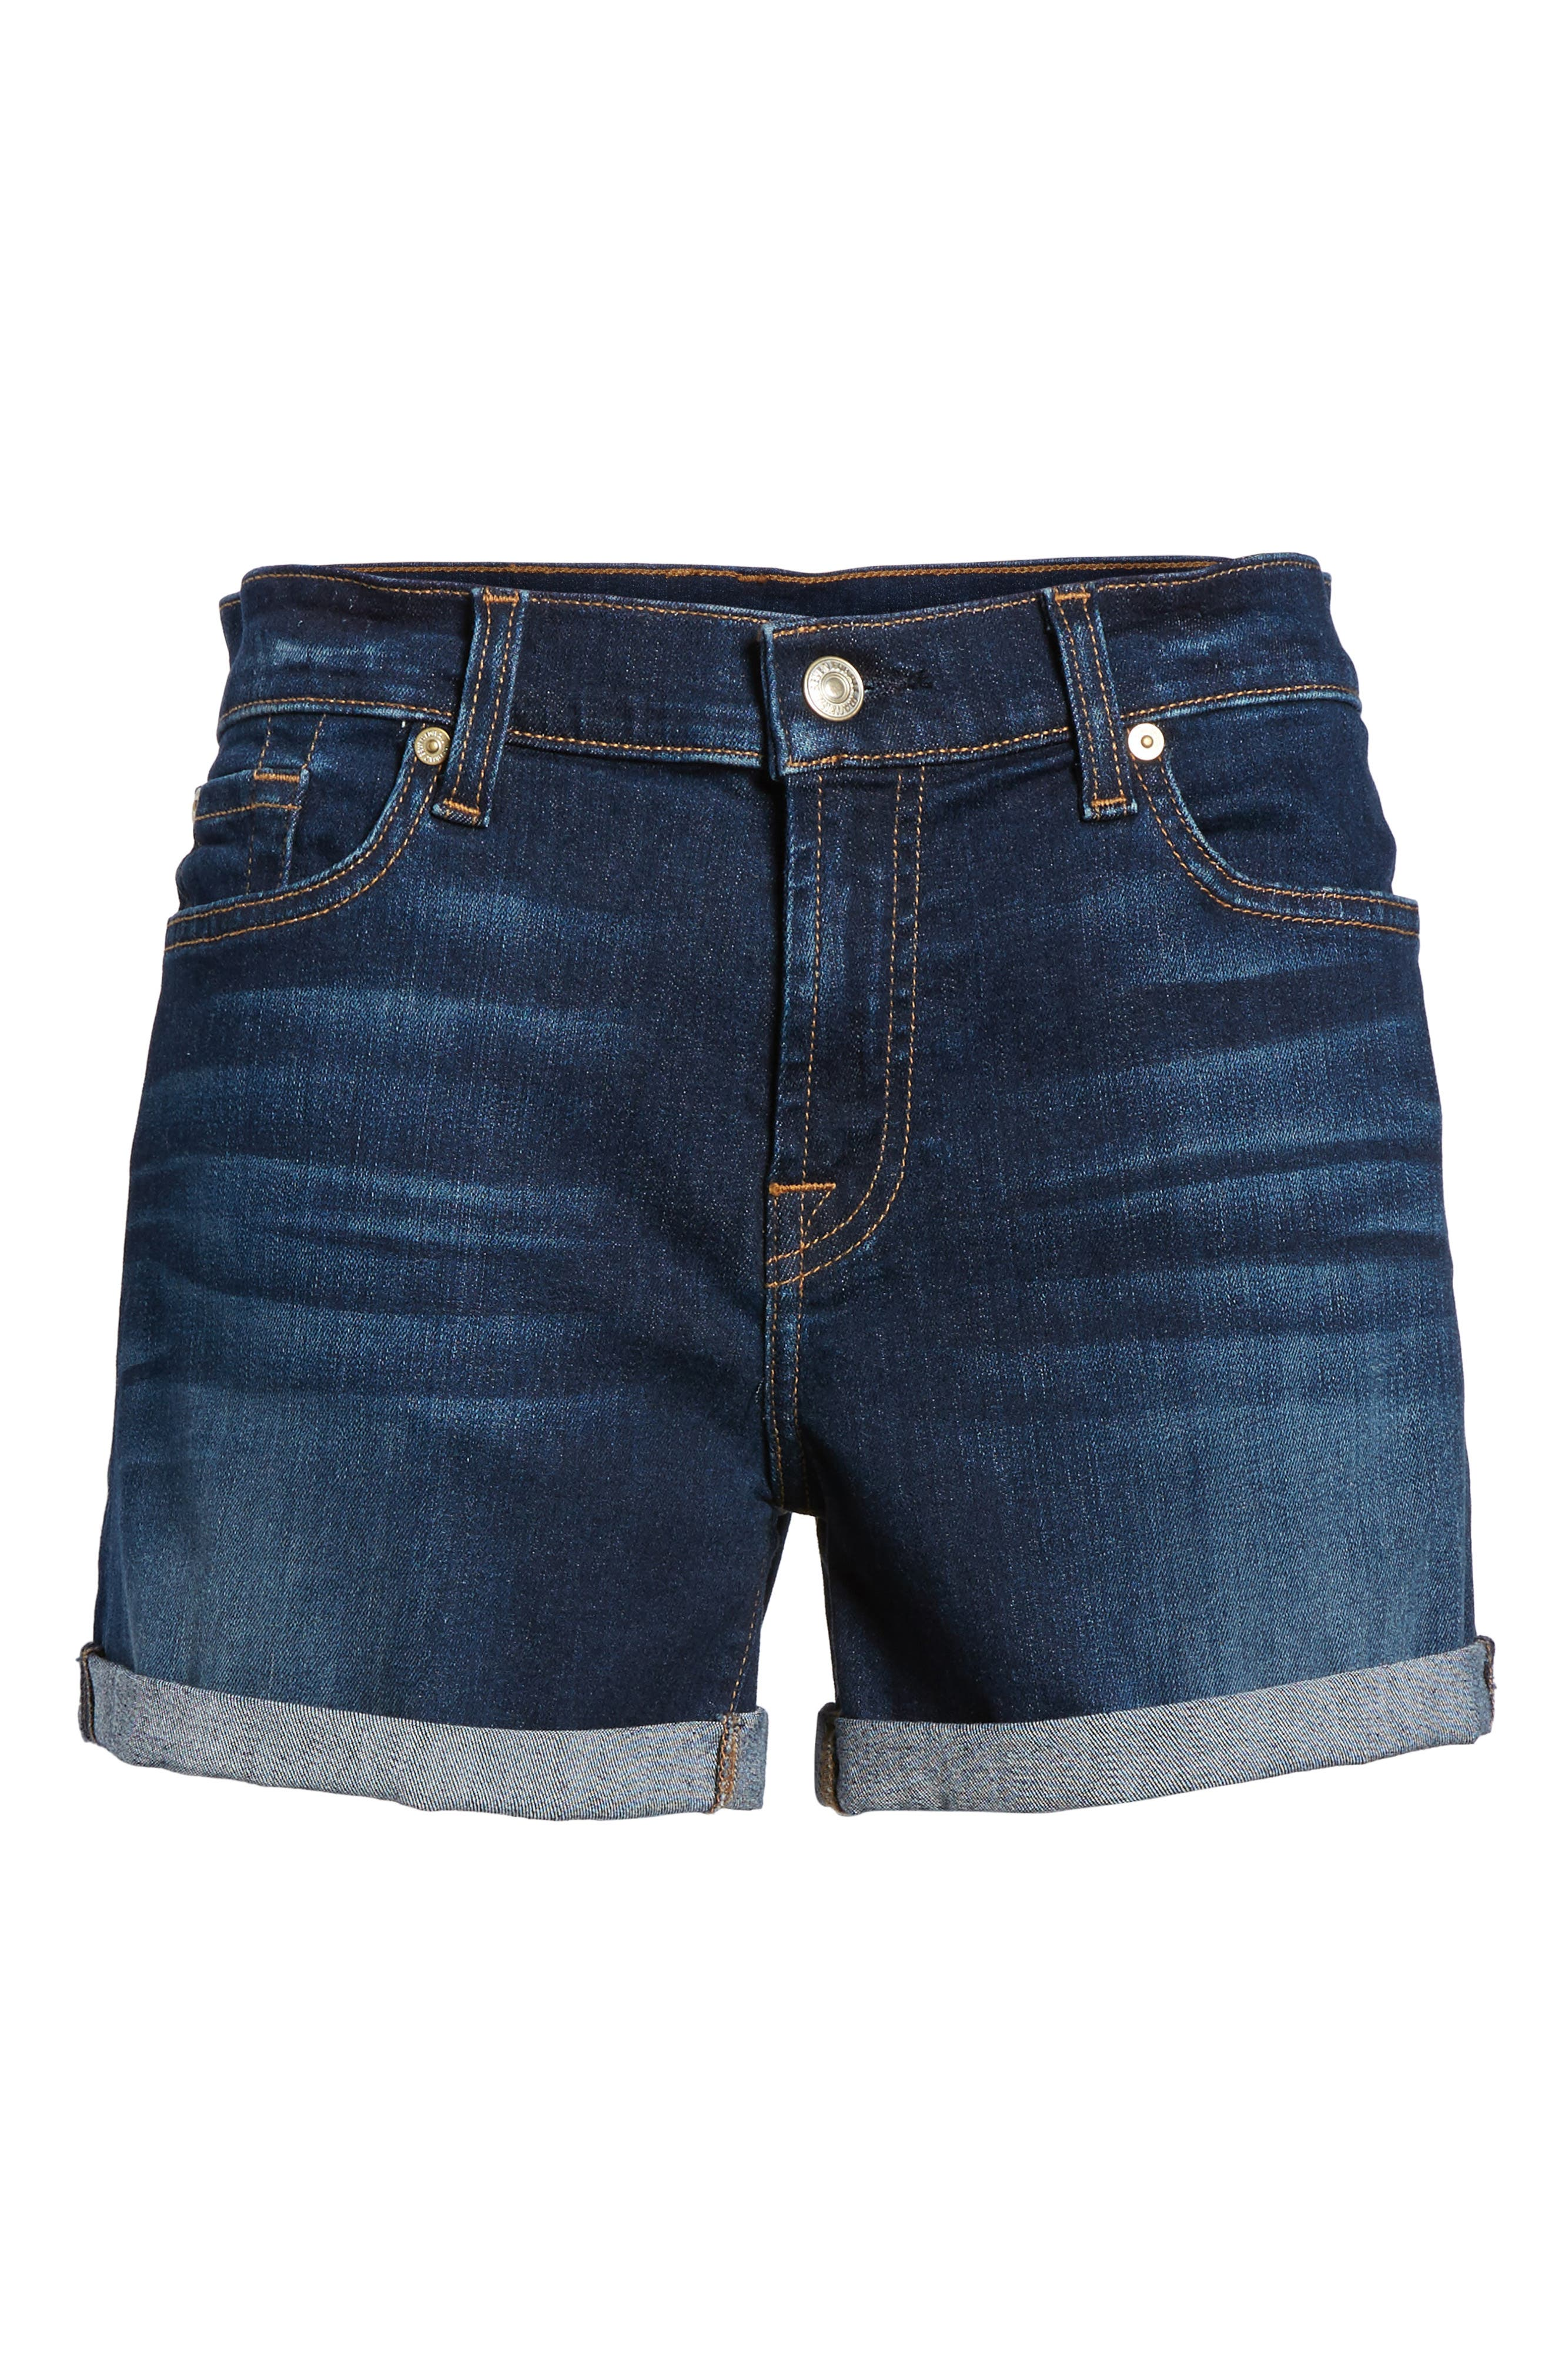 b(air) Cuffed Denim Shorts,                             Alternate thumbnail 7, color,                             MORENO